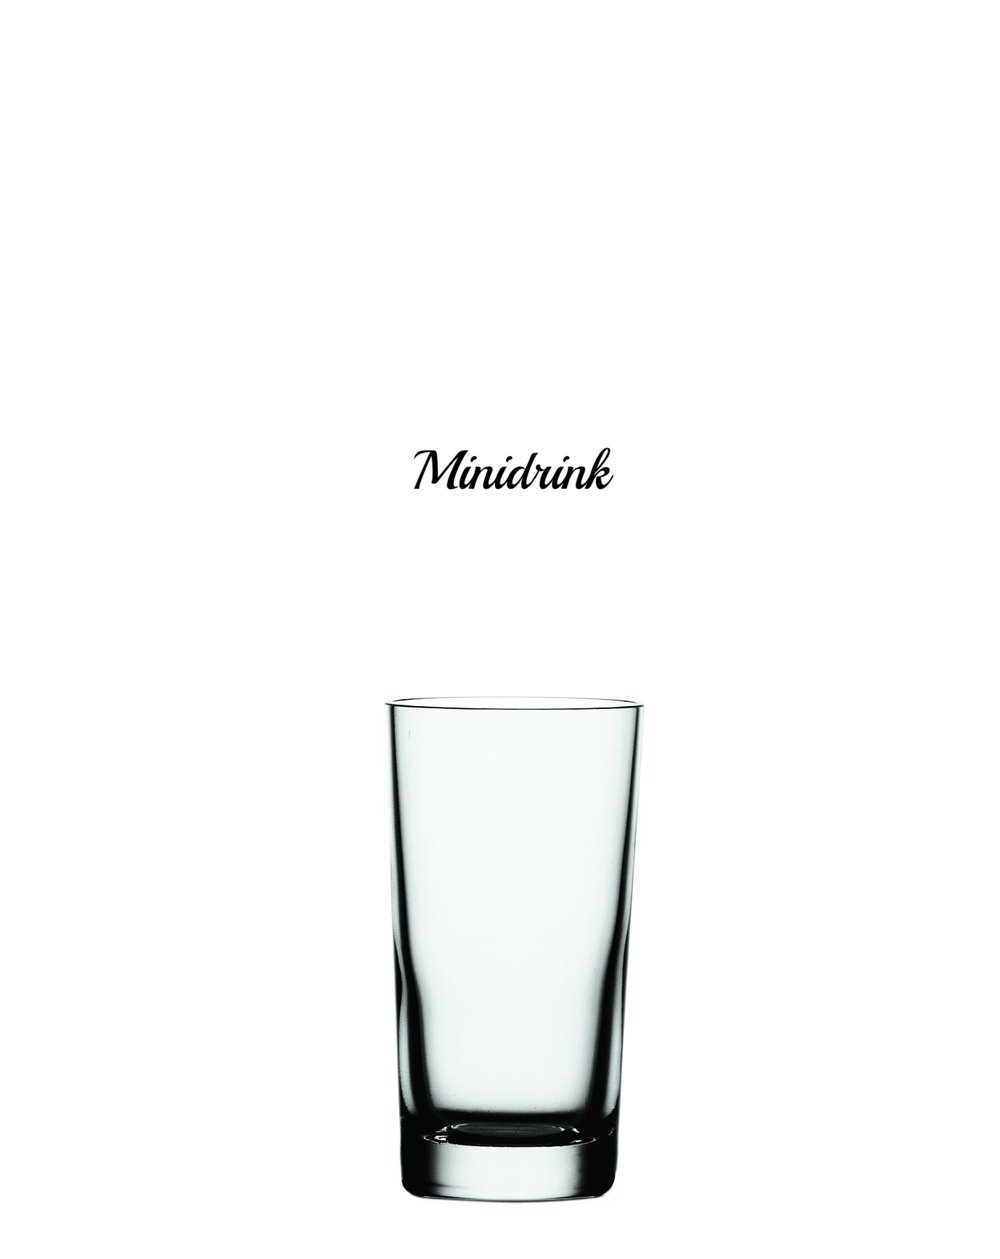 Classic Bar Minidrink 9008046.jpg